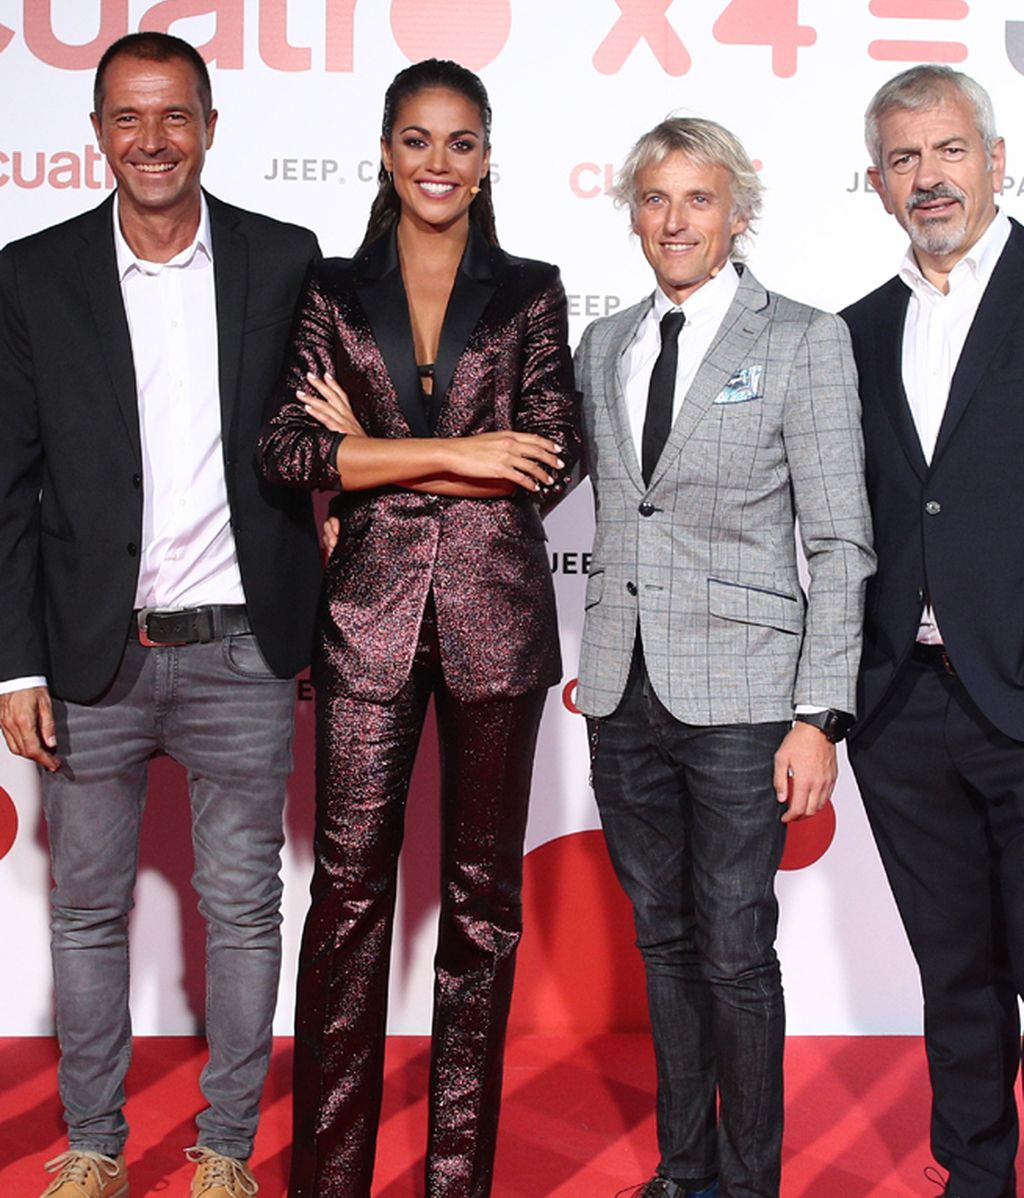 Manu Carreño, Lara Álvarez, Jesús Calleja y Carlos Sobera